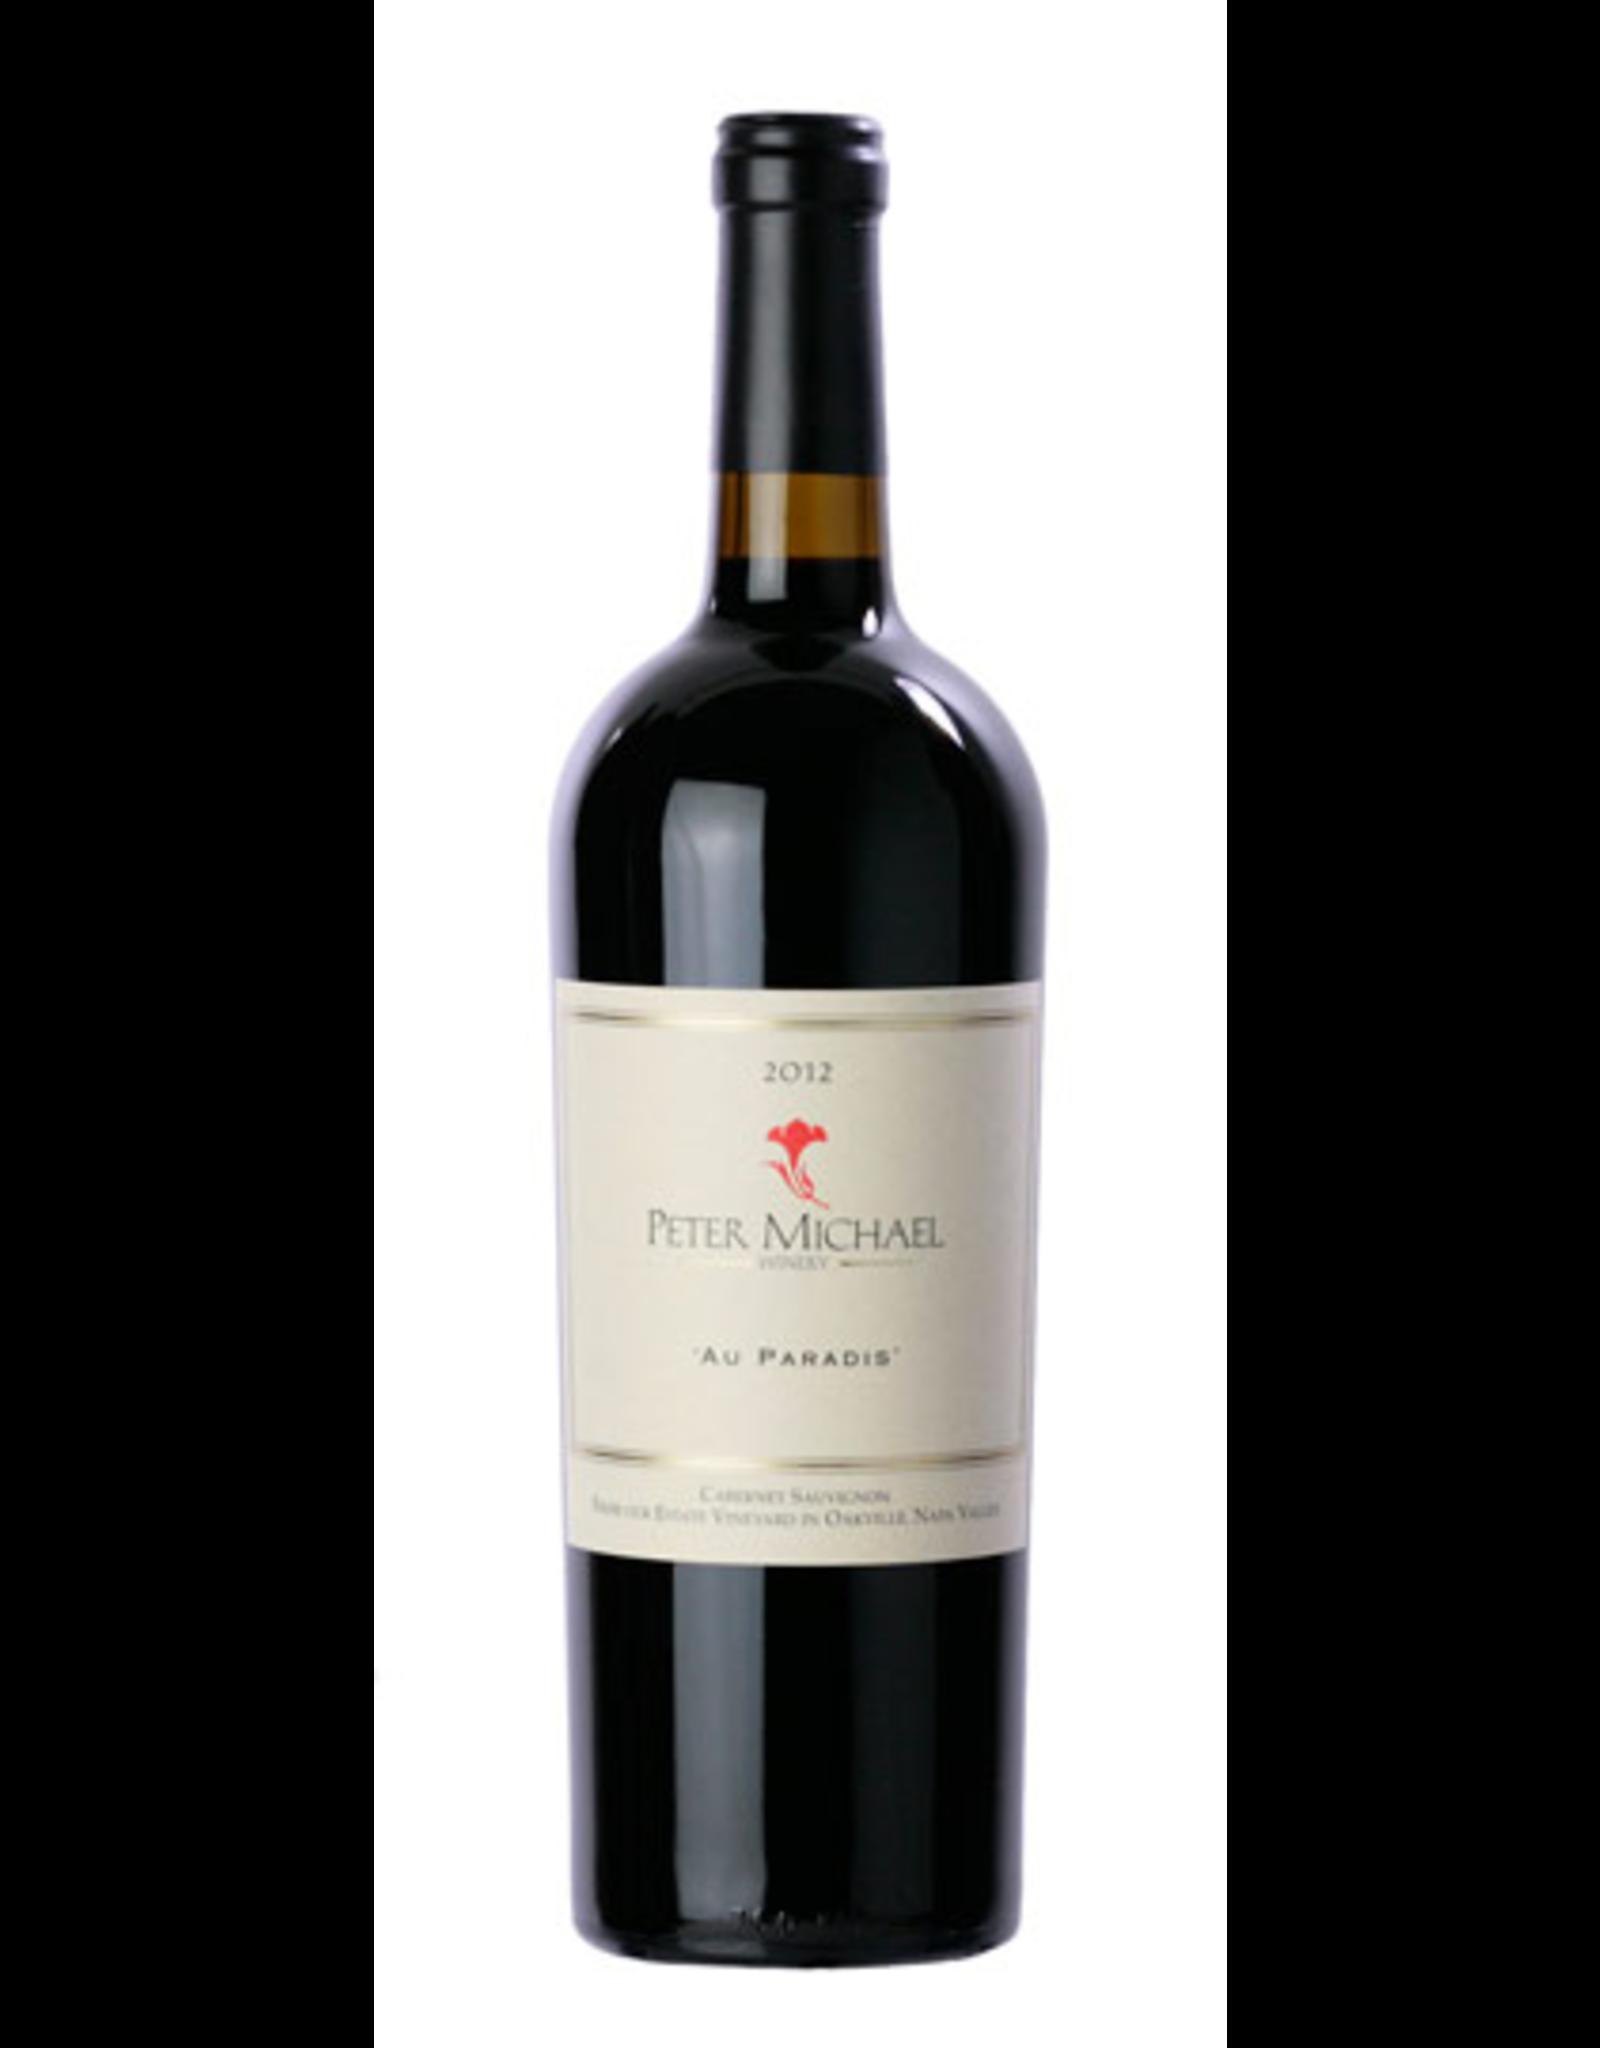 Red Wine 2012, Peter Michael Au Paradis, Cabernet Sauvignon, Oakville, Napa Valley, California, 15.8% Alc, CT93, JS98, WS #1 Top 100